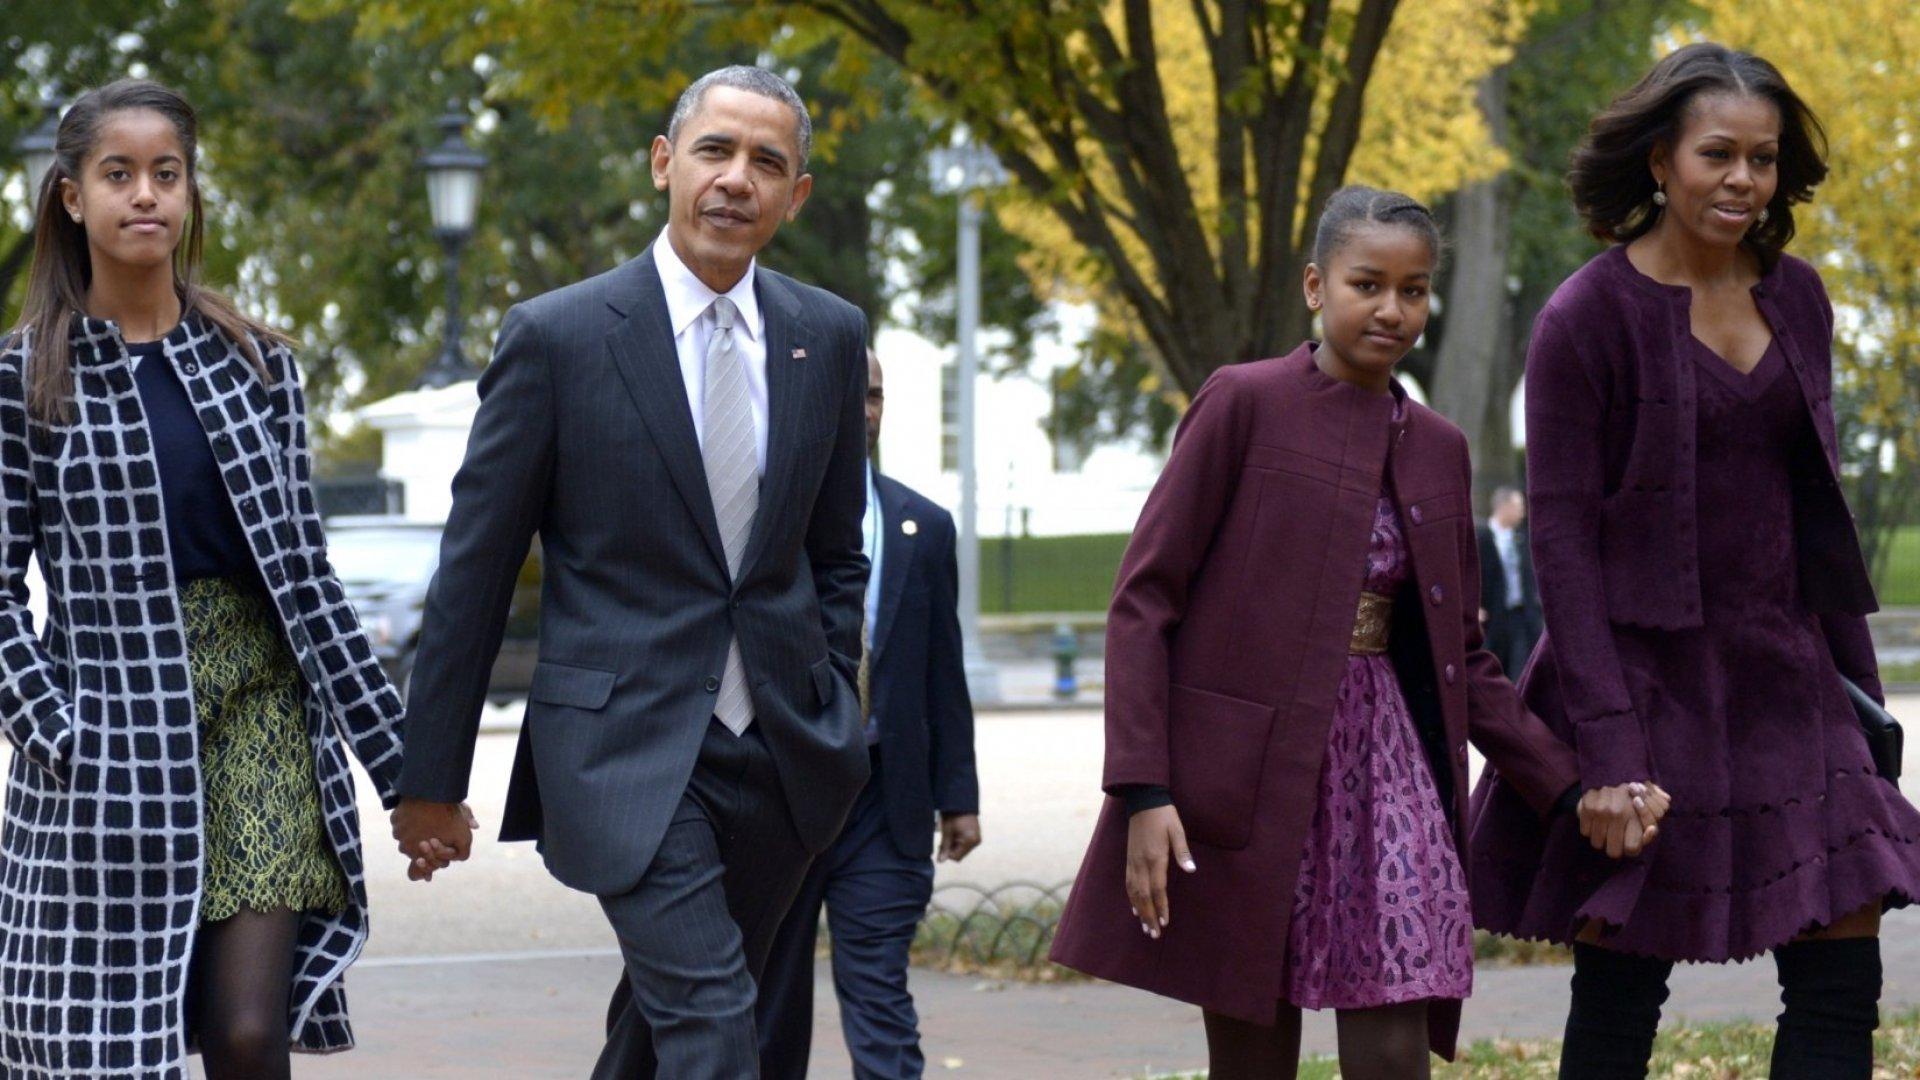 Malia Obama, Barack Obama, Sasha Obama, and Michelle Obama.